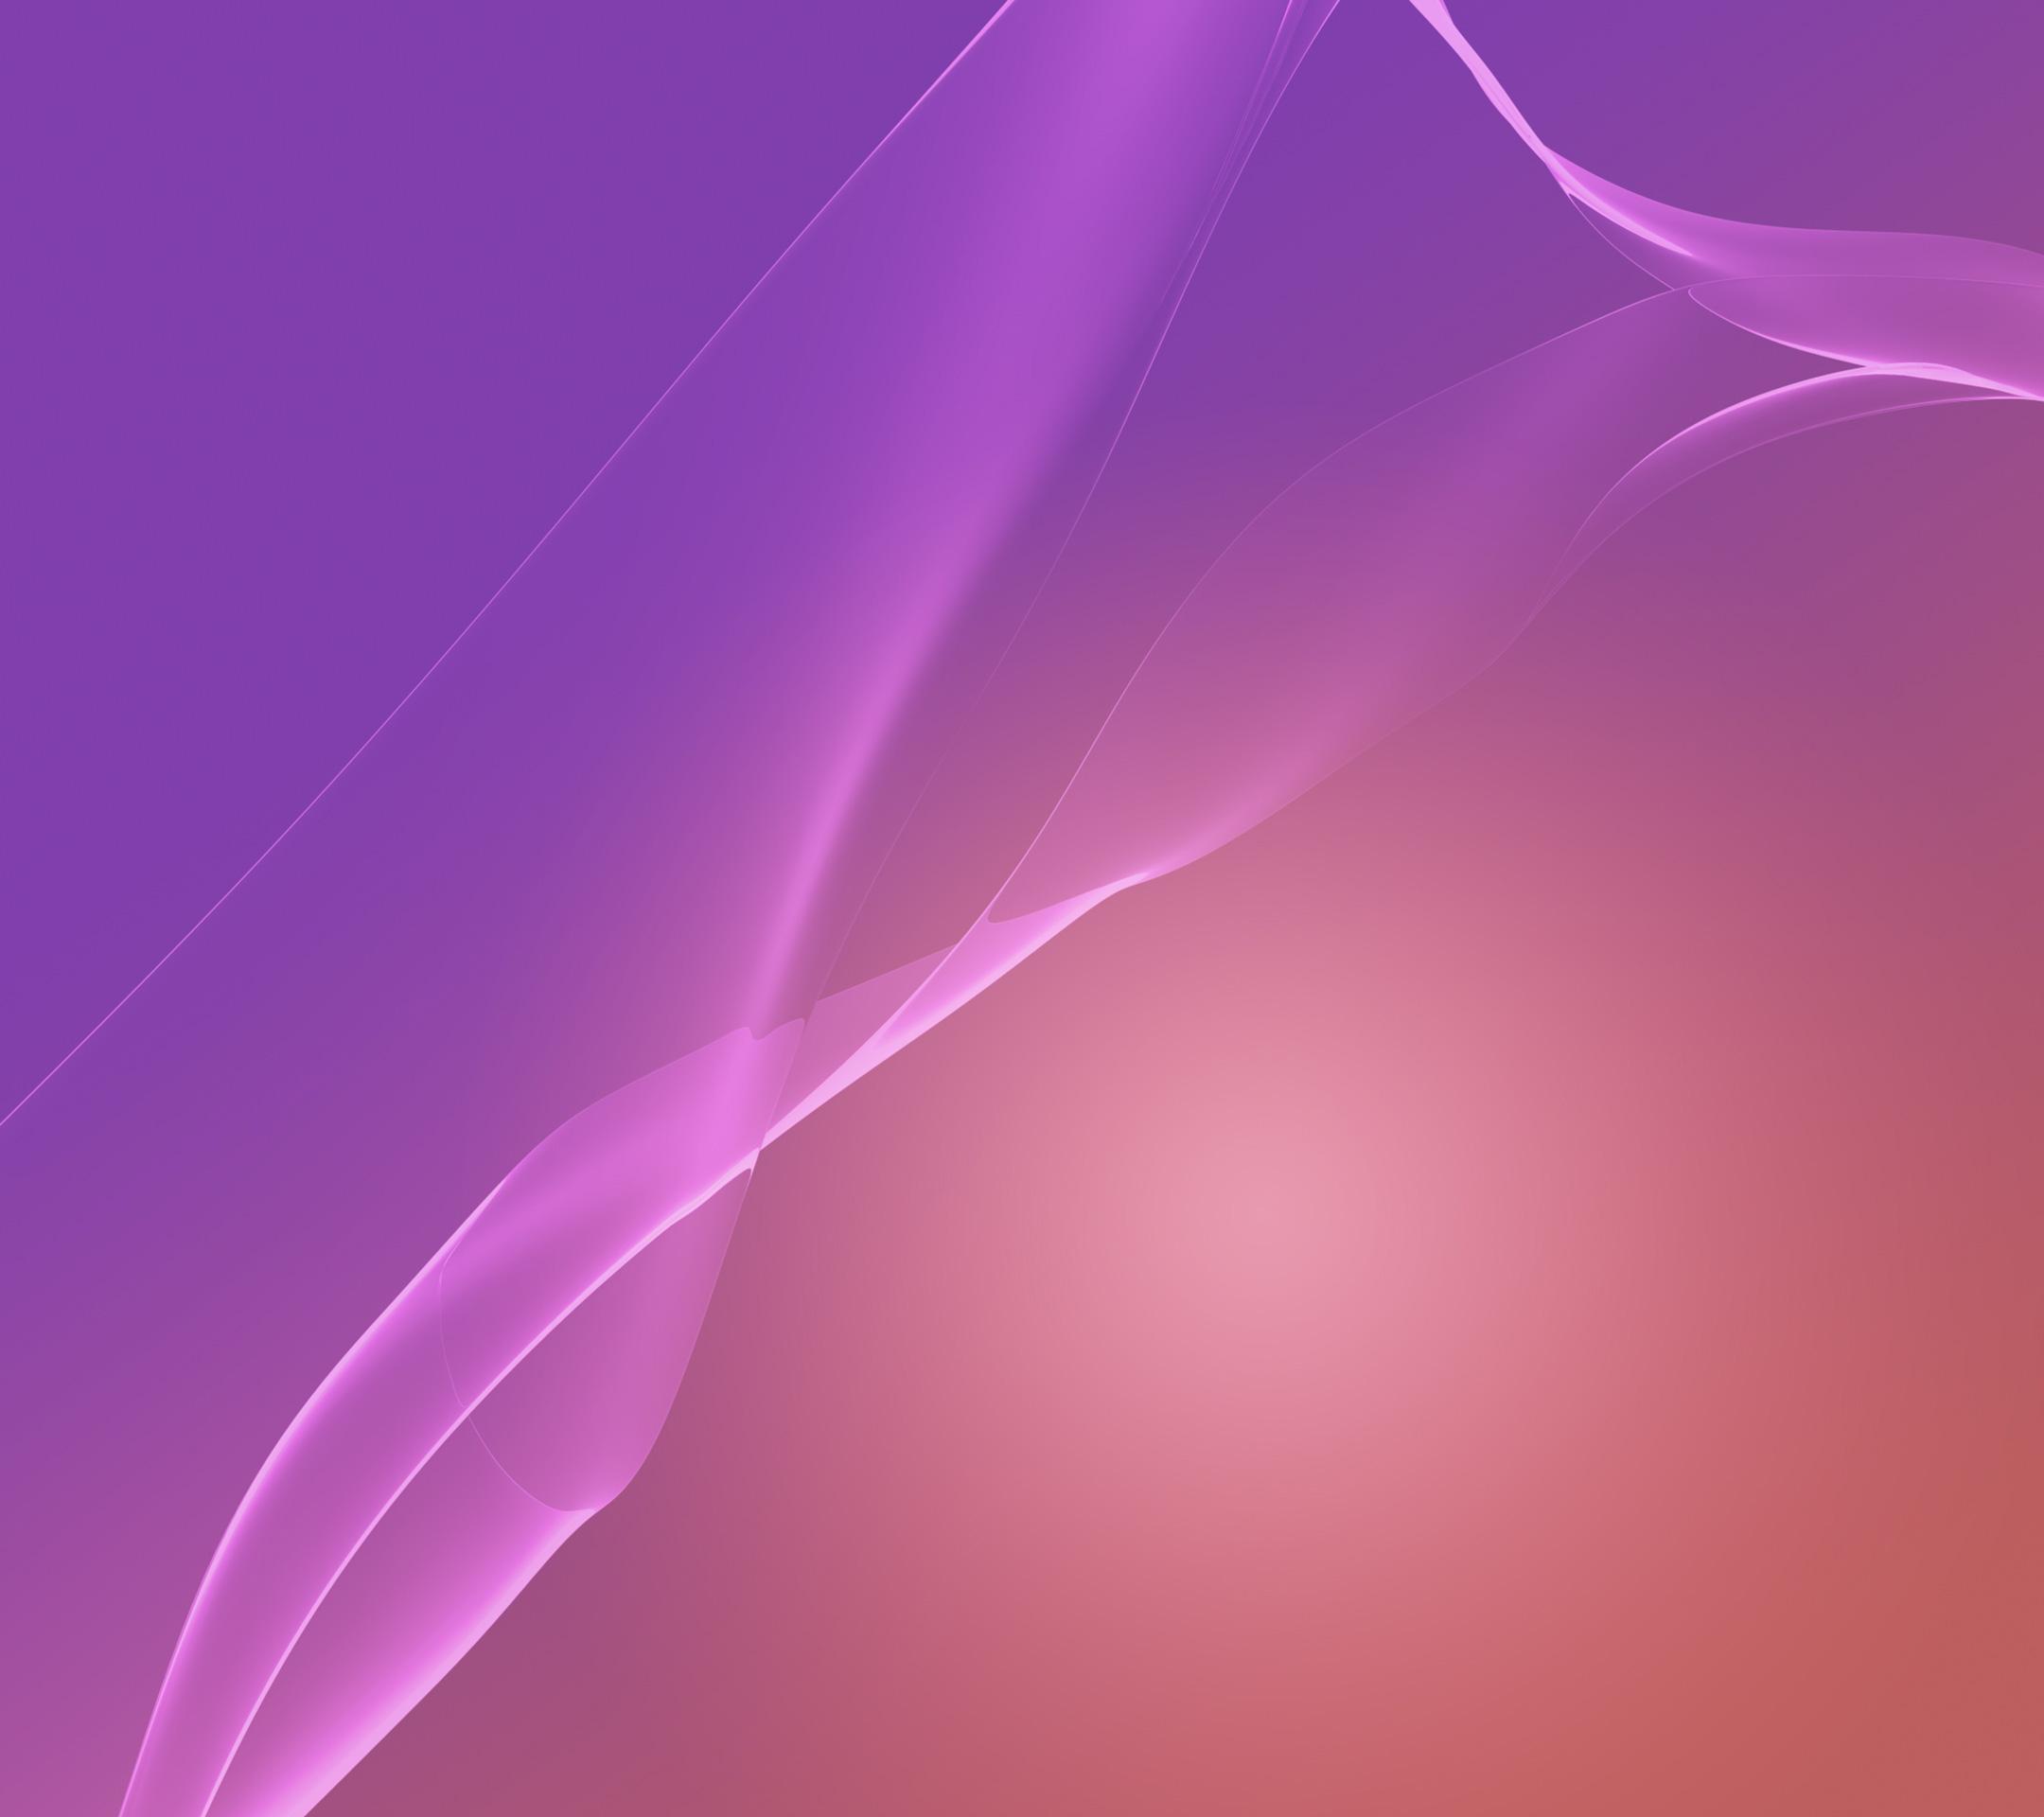 Must see Wallpaper Home Screen Xperia - tumblr_static_listen_ps4_droidviews  HD_449824.jpg